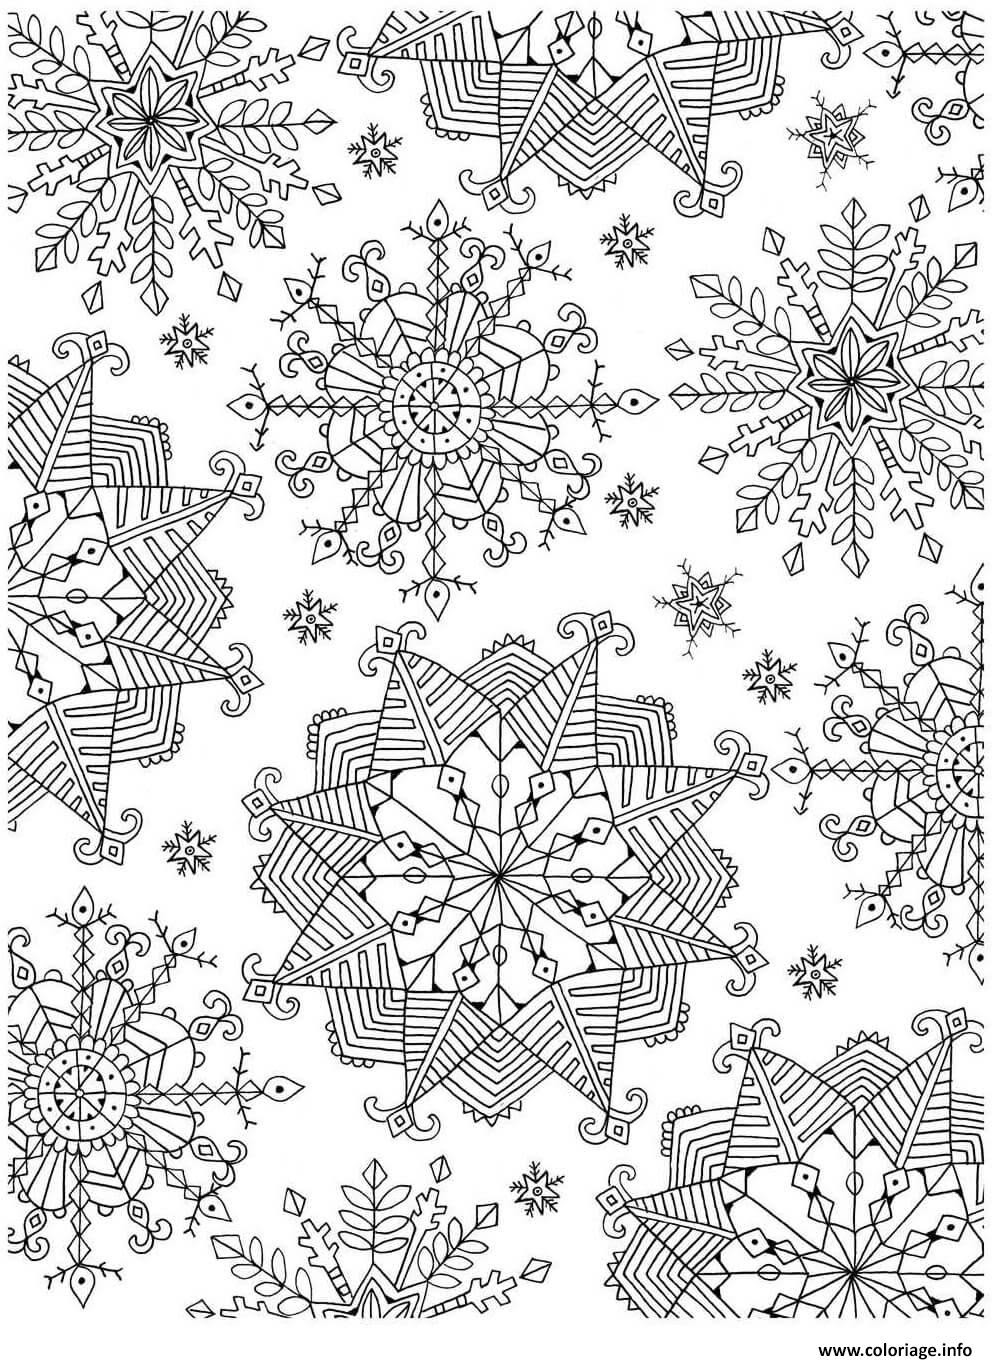 Coloriage Flocon De Neige Adulte Noel Zentangle Dessin  Imprimer